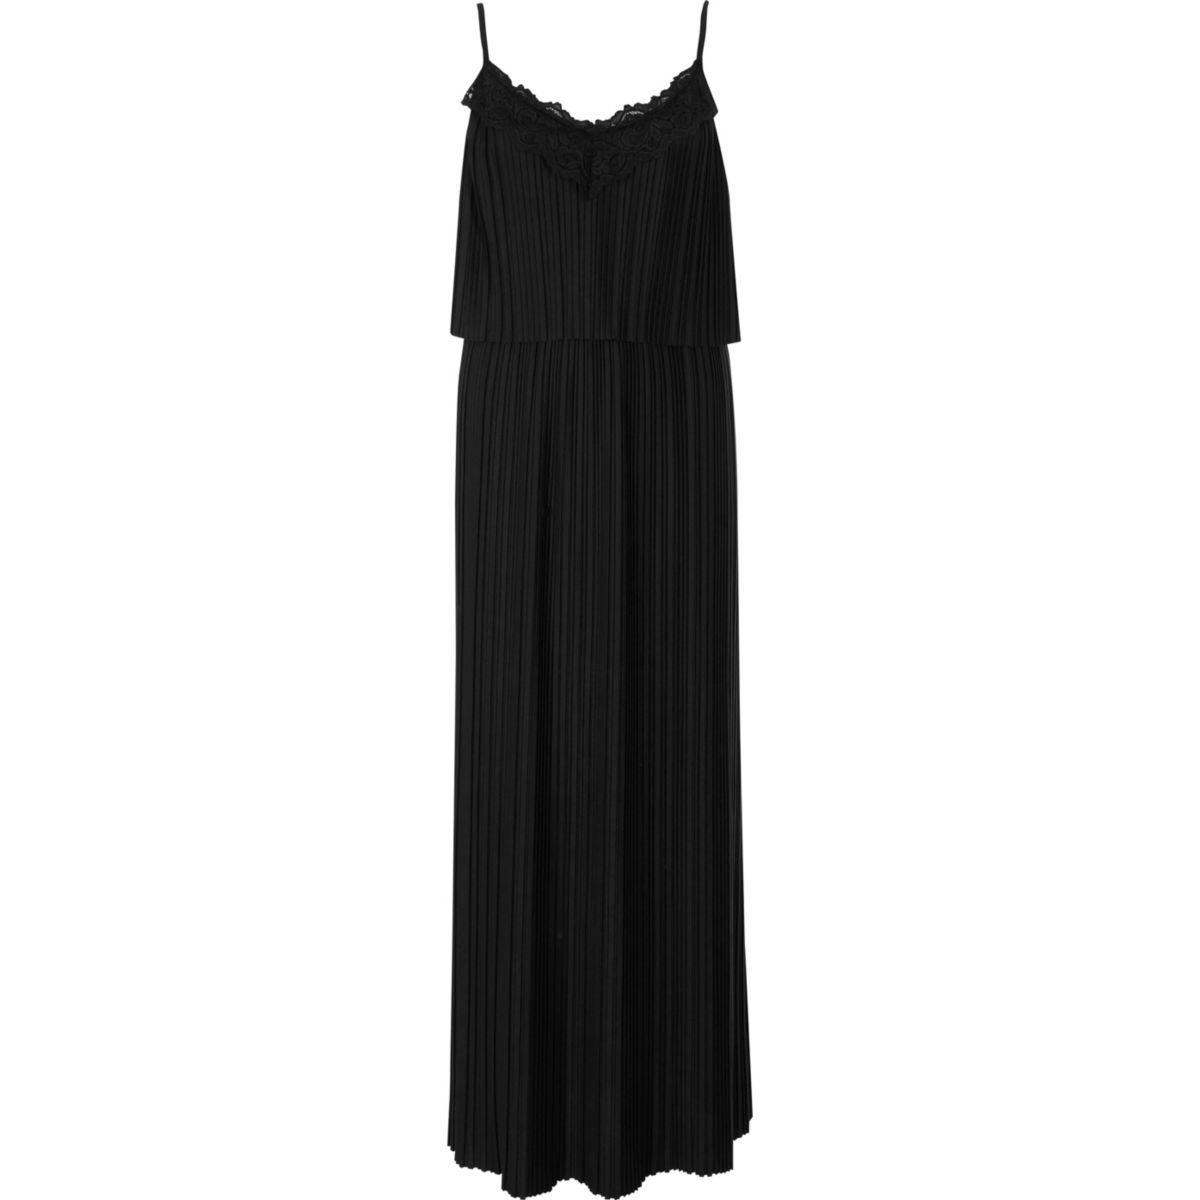 Black plisse lace insert cami maxi dress